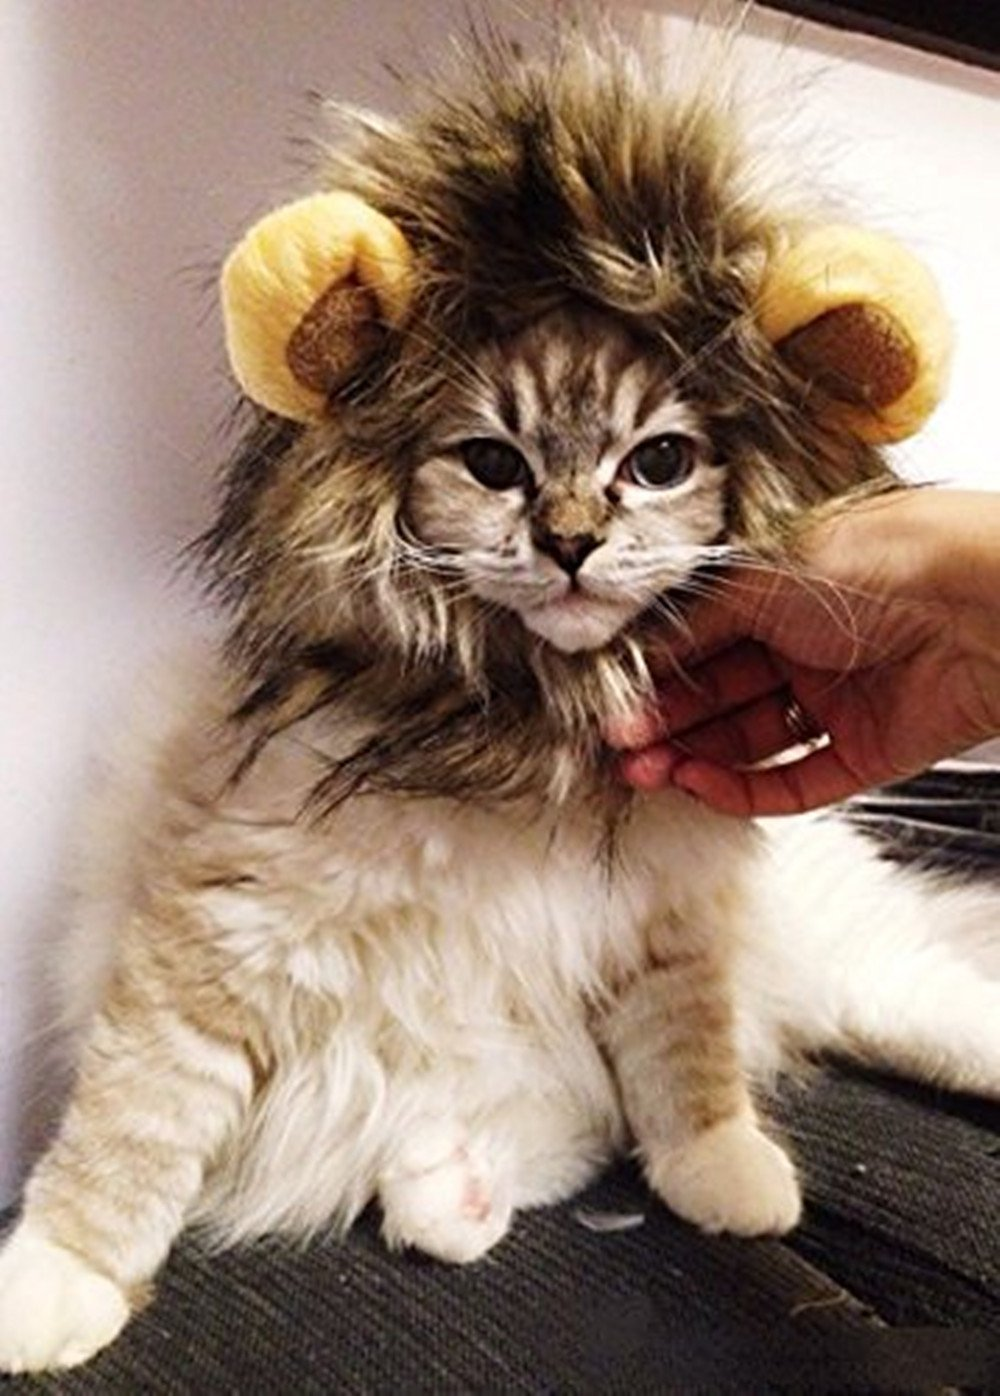 Stonges Pet Costume Lion Mane Wig per Dog Cat Halloween Dress up con orecchie